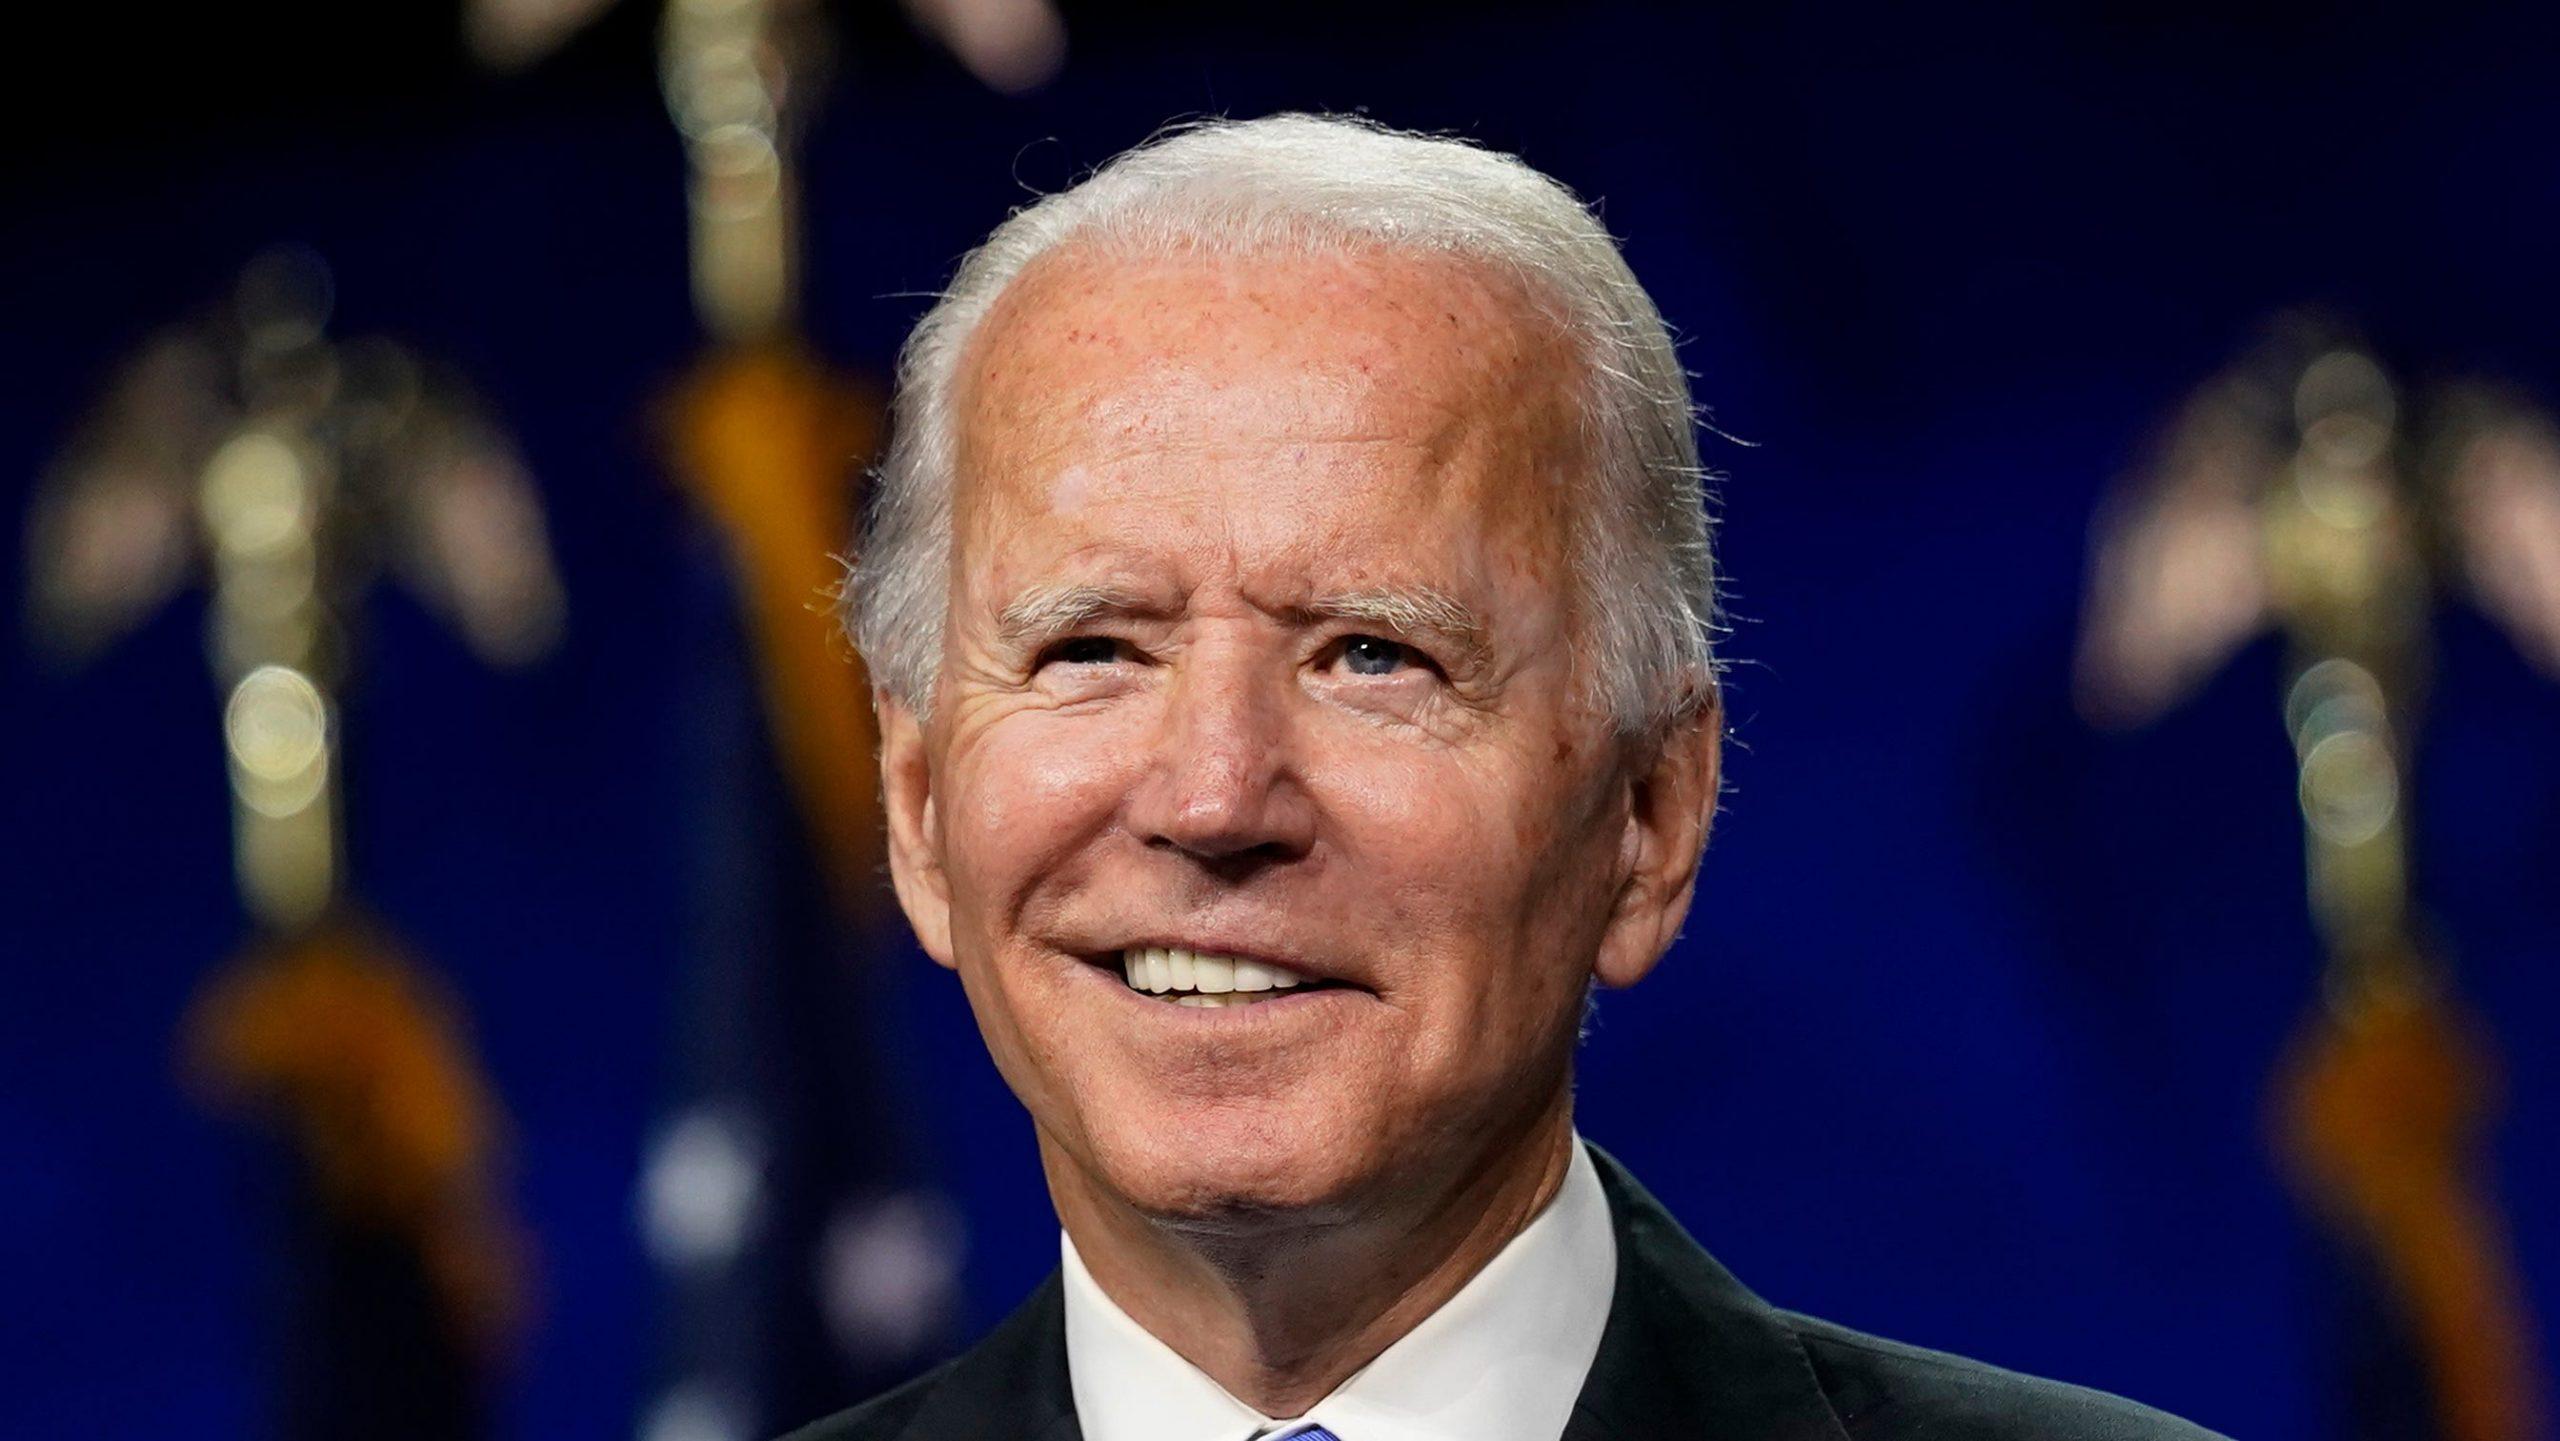 Priceless: Biden Explains His Job to Elementary Students